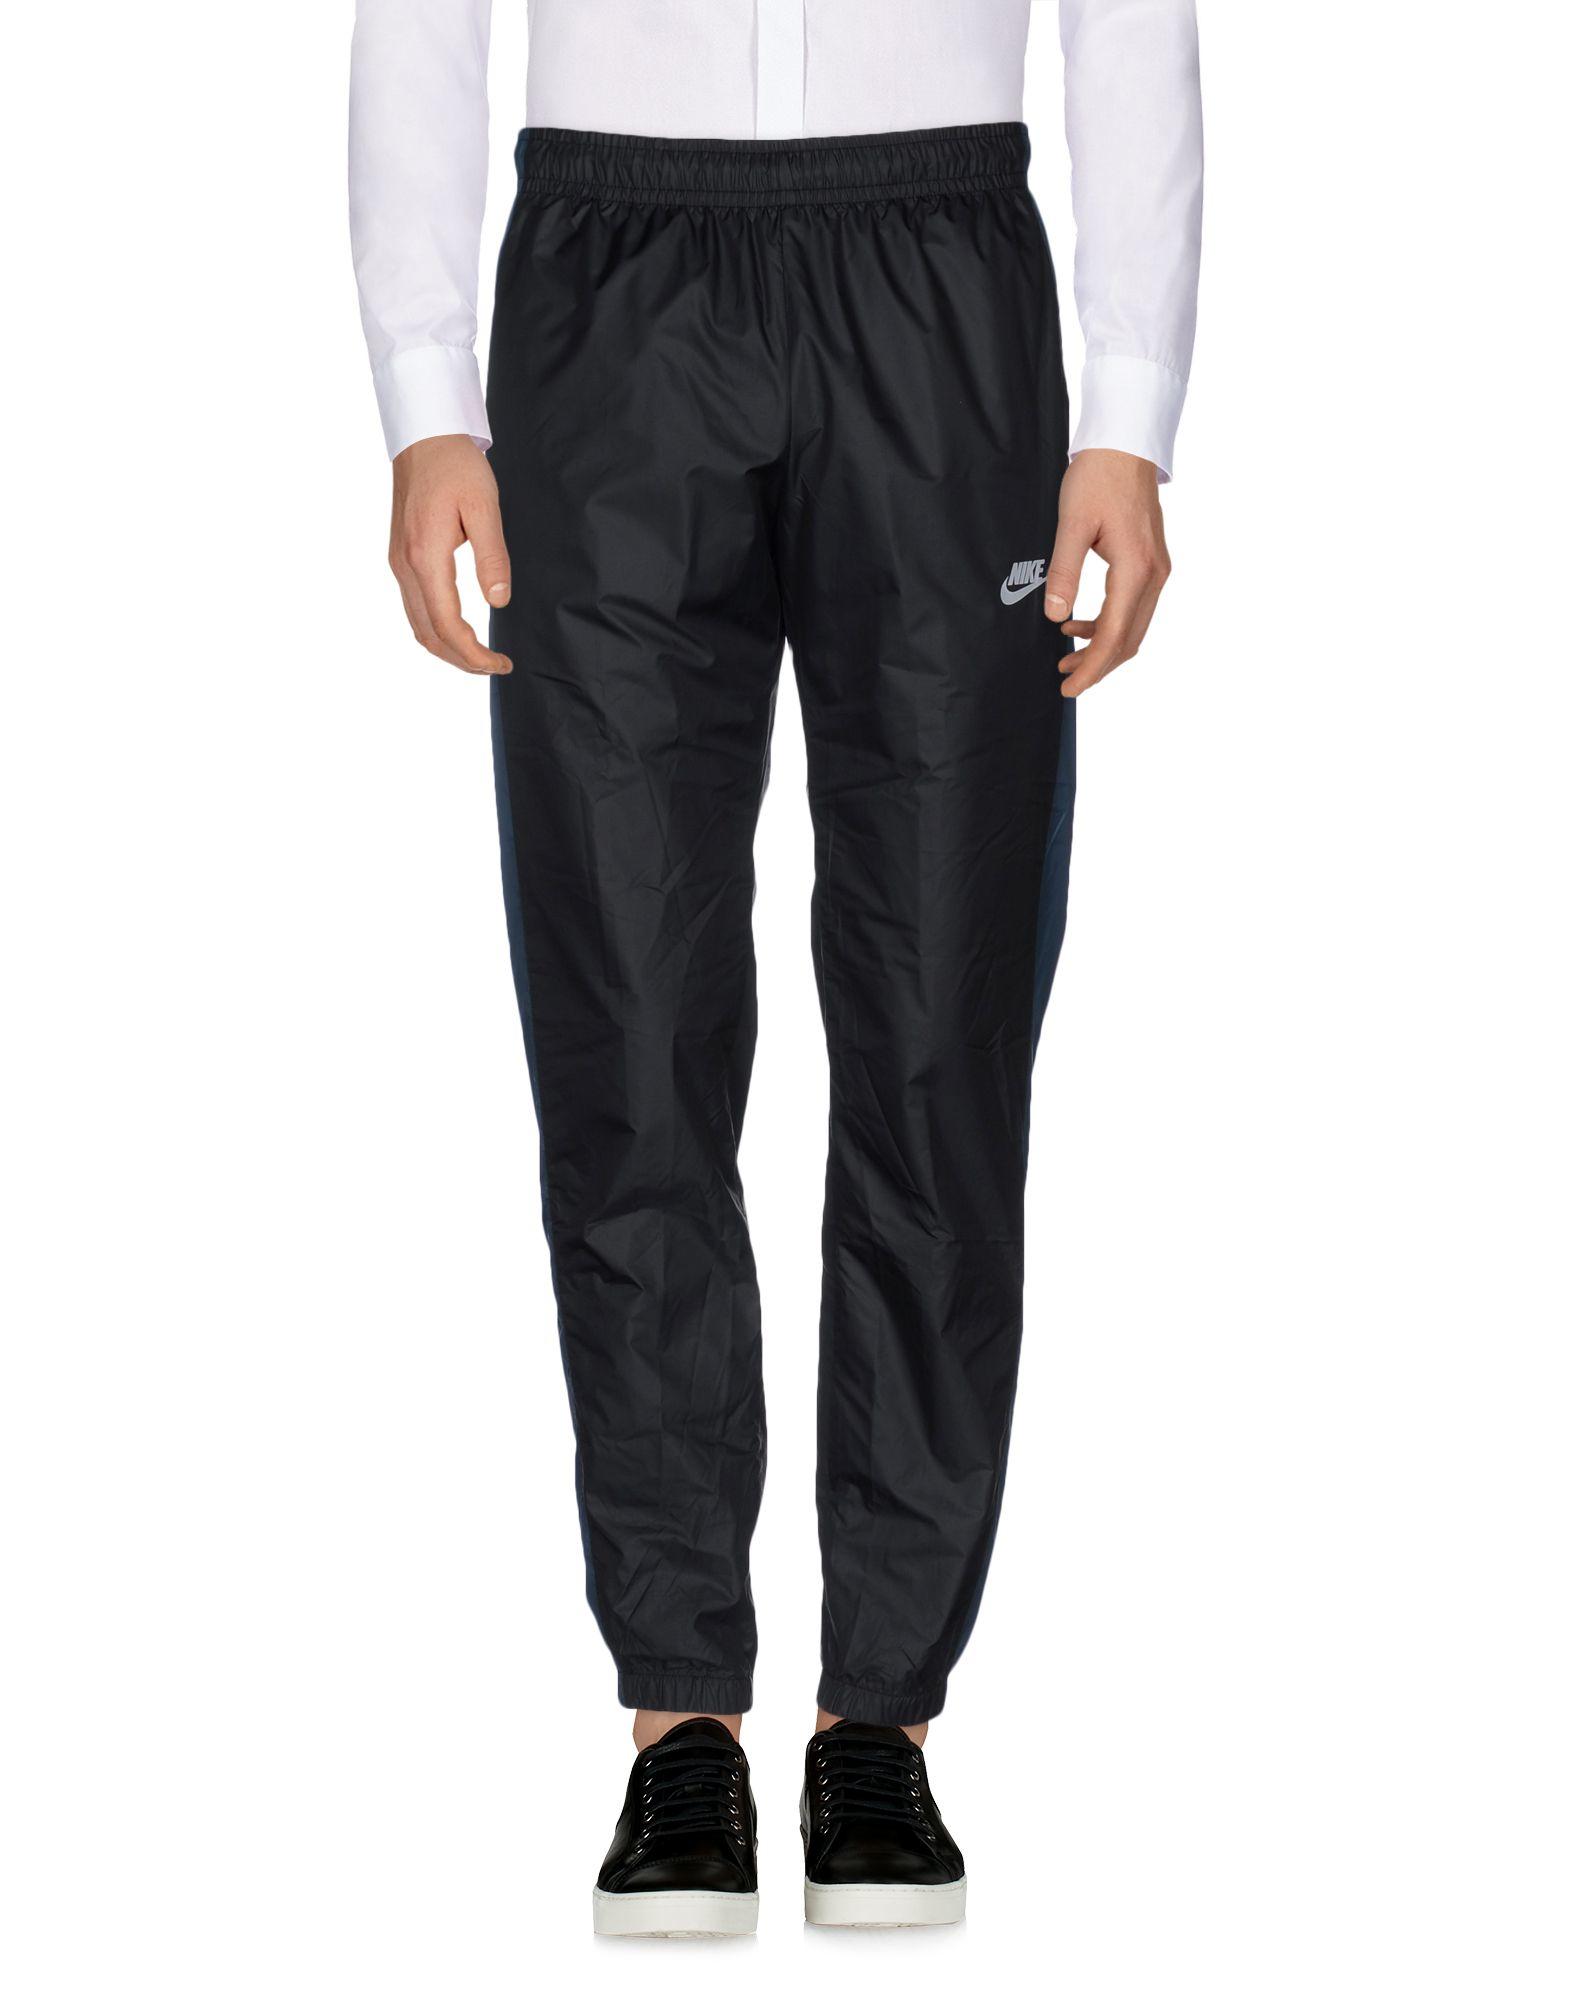 Lyst - Nike Casual Pants in Black for Men